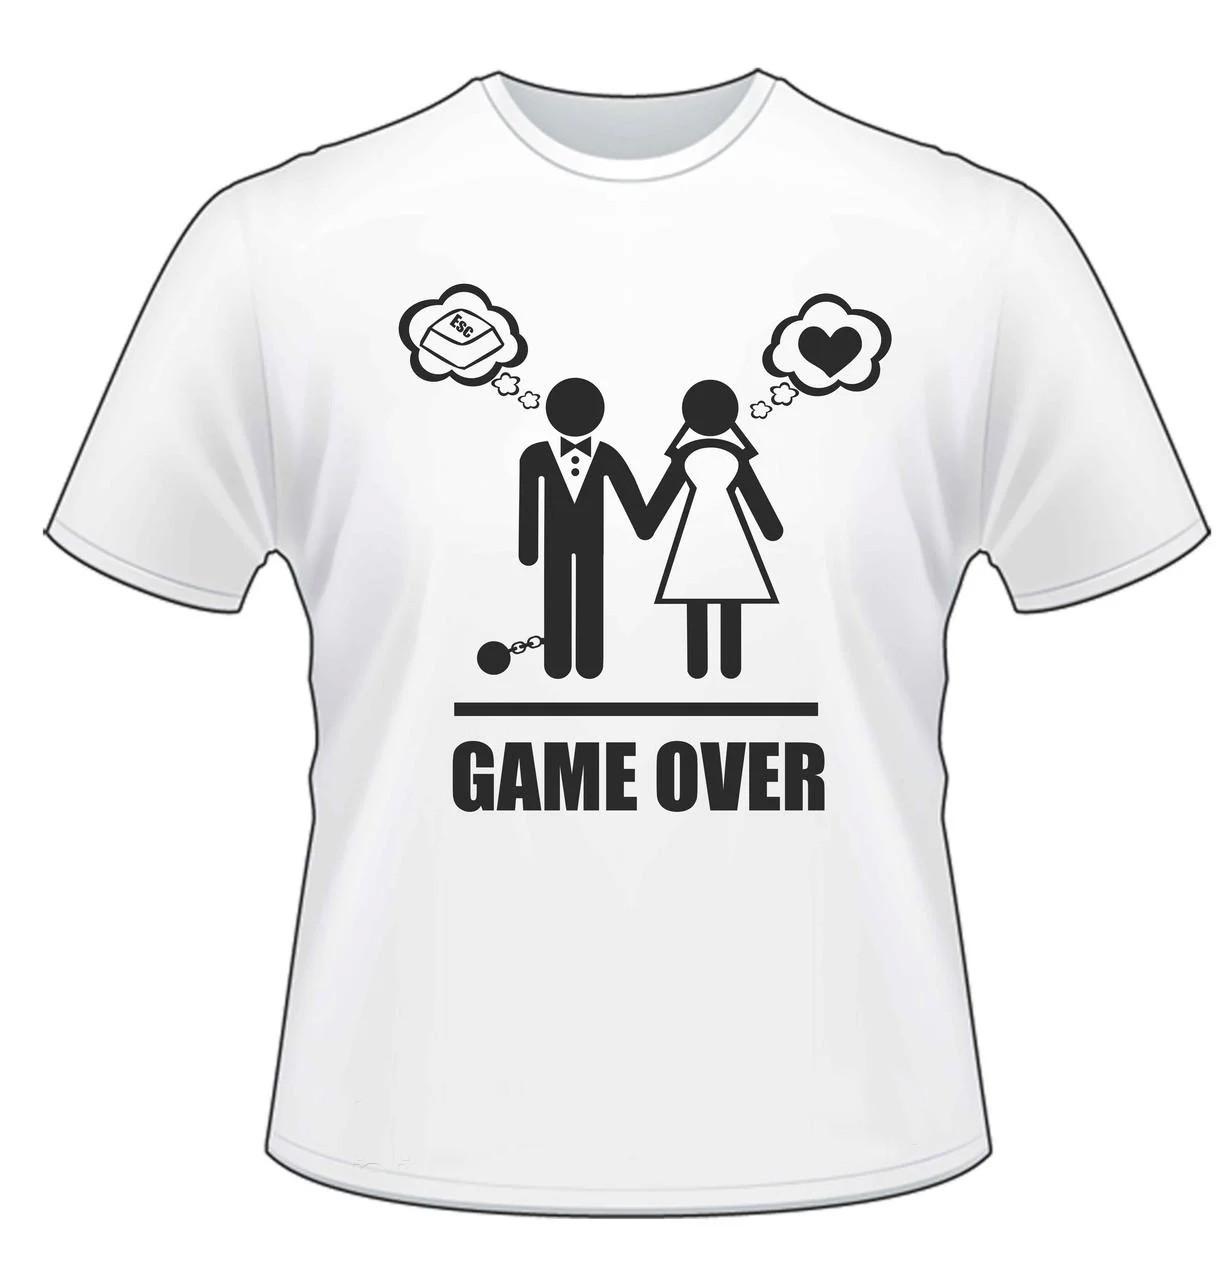 "Чоловіча футболка з принтом ""Game over"" Push IT"